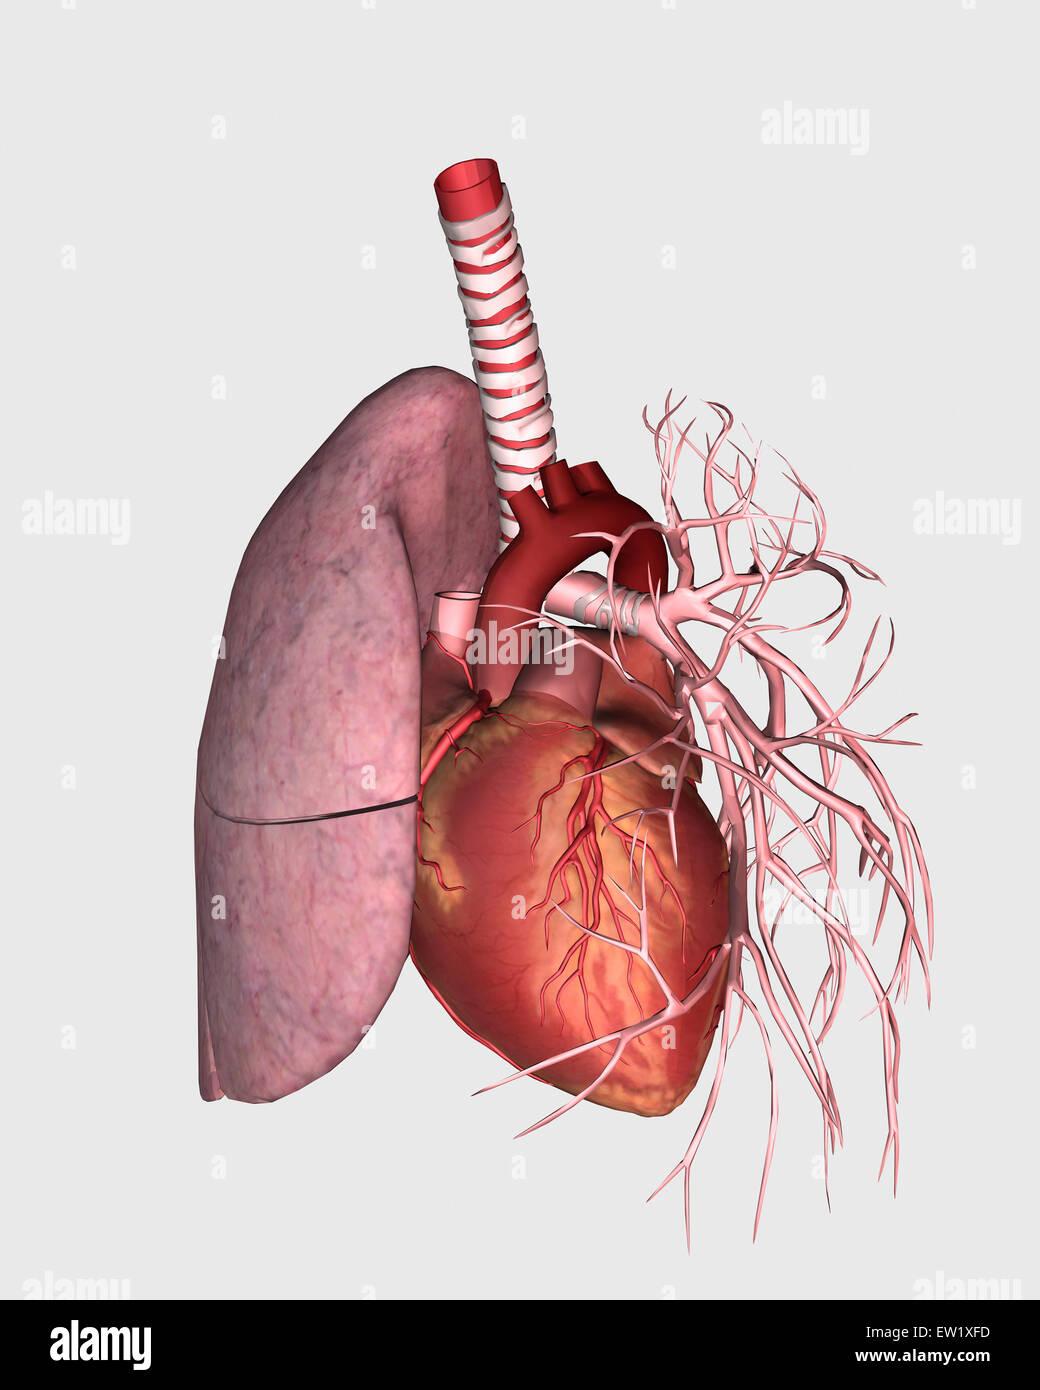 Pulmonary Circulation Of Human Heart And Lung Stock Photo 84250641